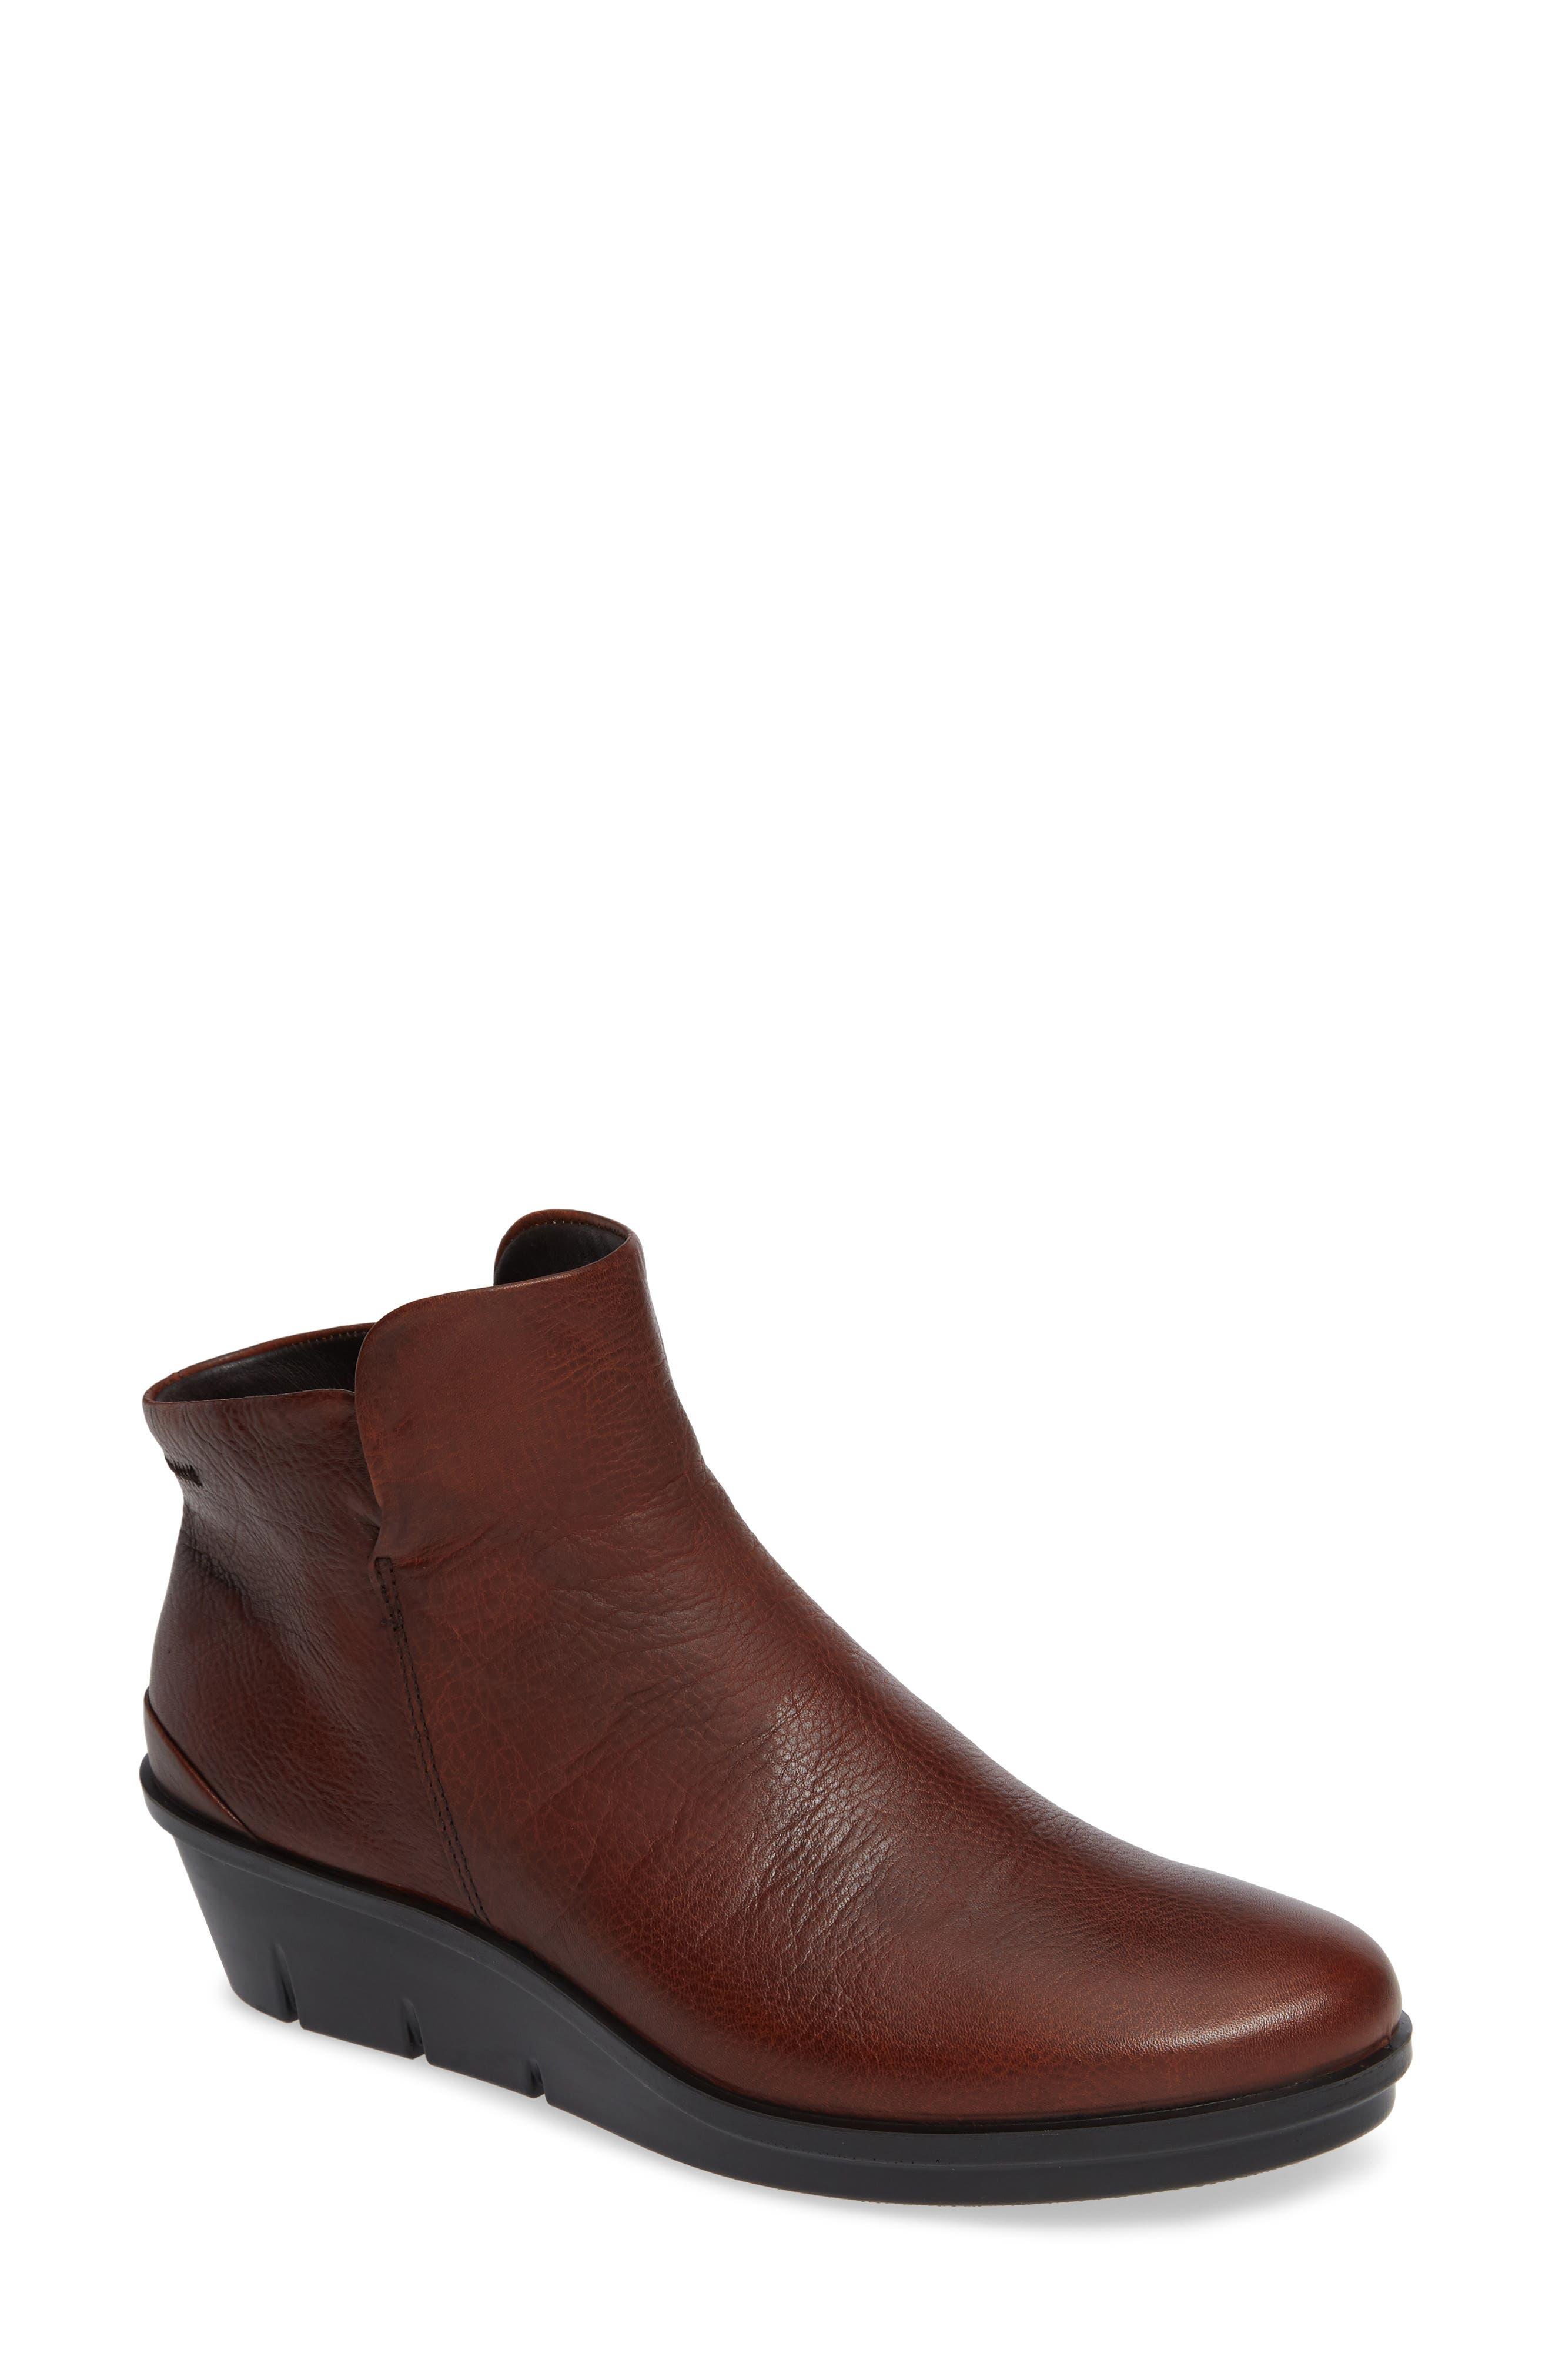 Ecco Skyler Wedge Boot, Brown